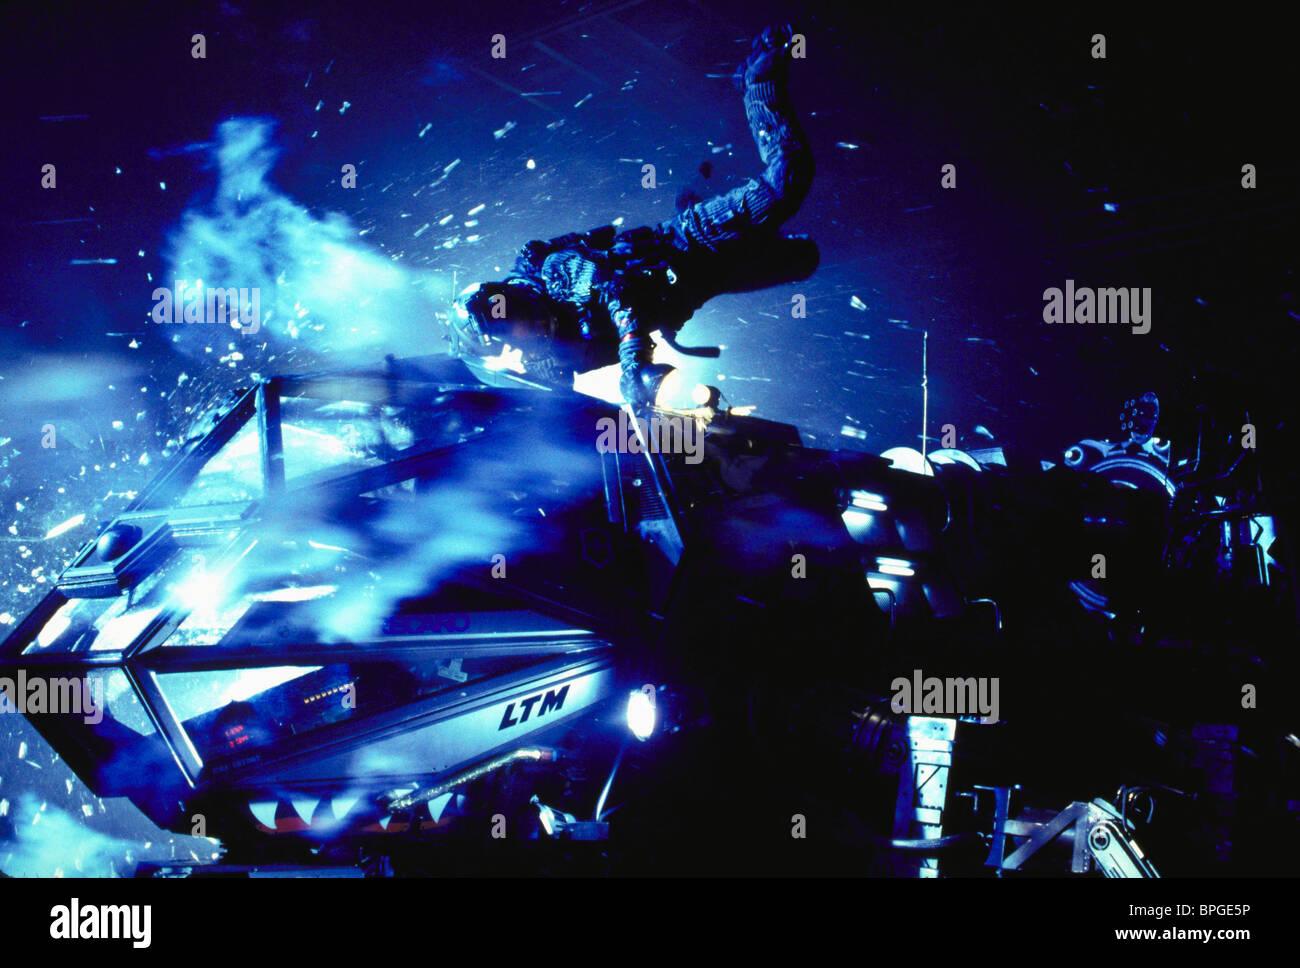 ACTION SCENE ARMAGEDDON (1998) - Stock Image